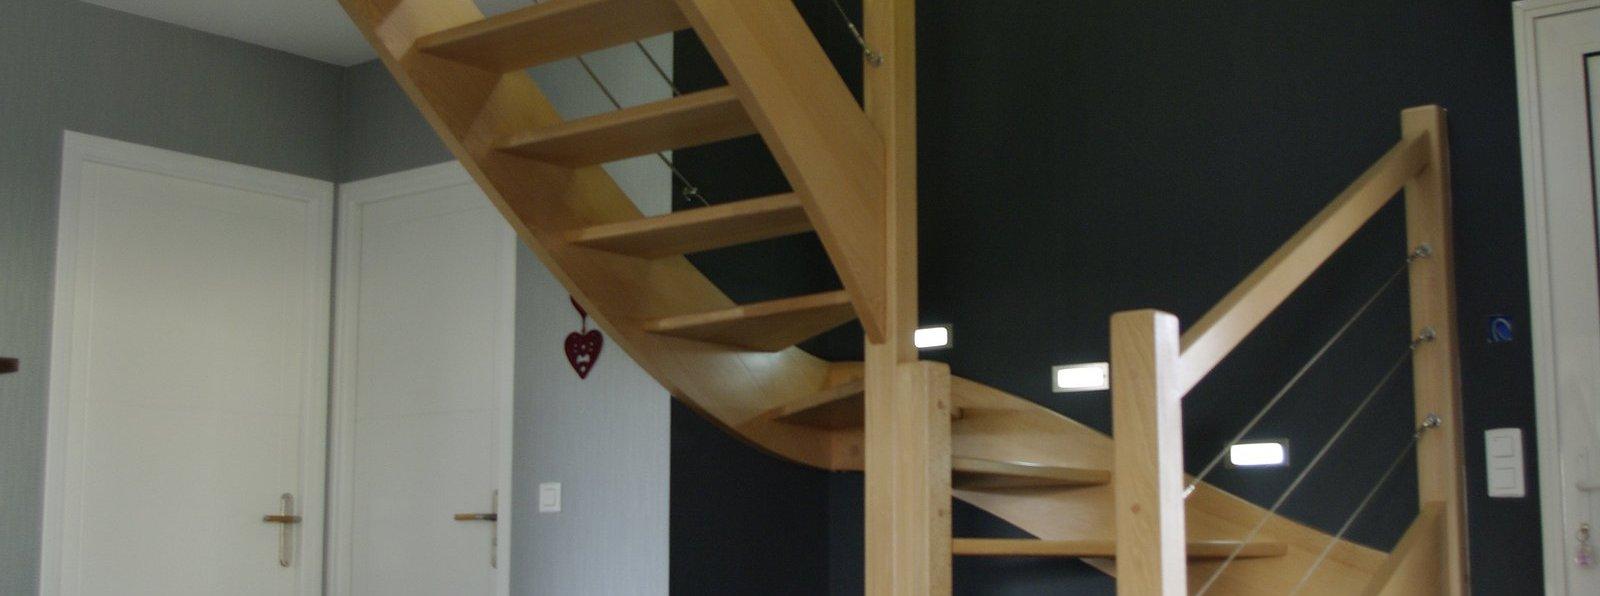 Sbm escaliers fabricant escaliers bois m tal loire 42 for Fabricant escalier bois